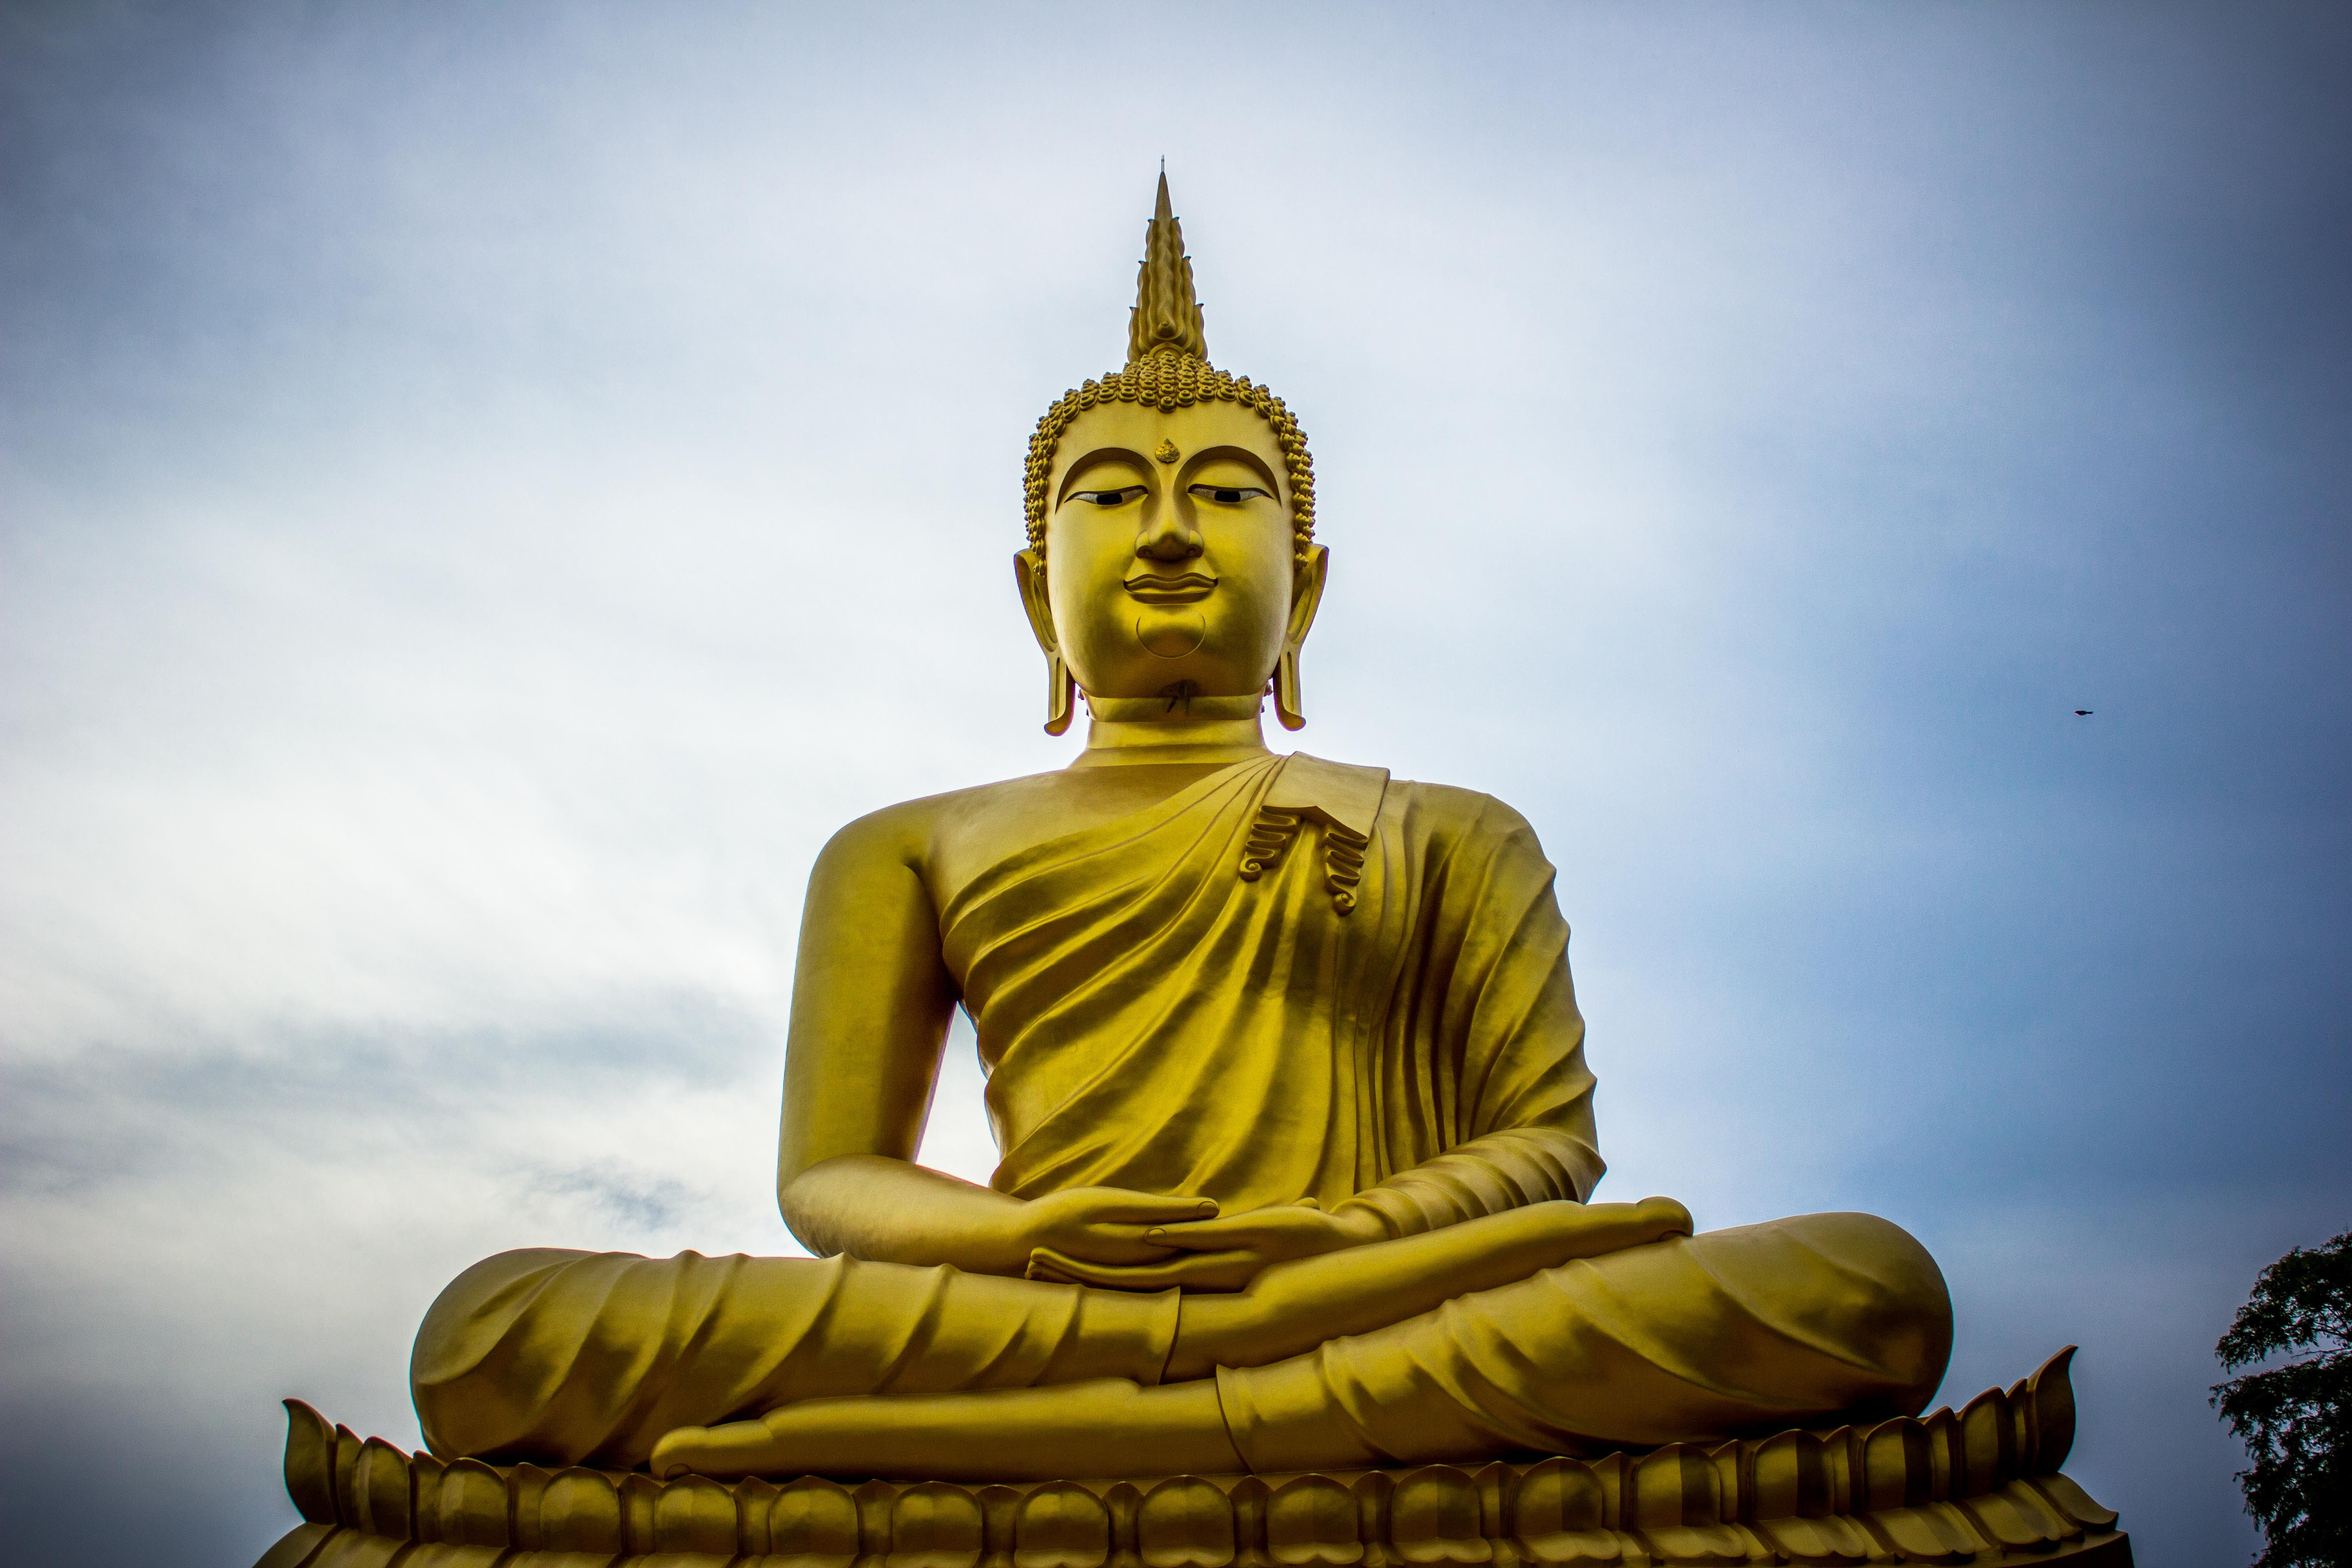 lord buddha tv live - HD1500×1000